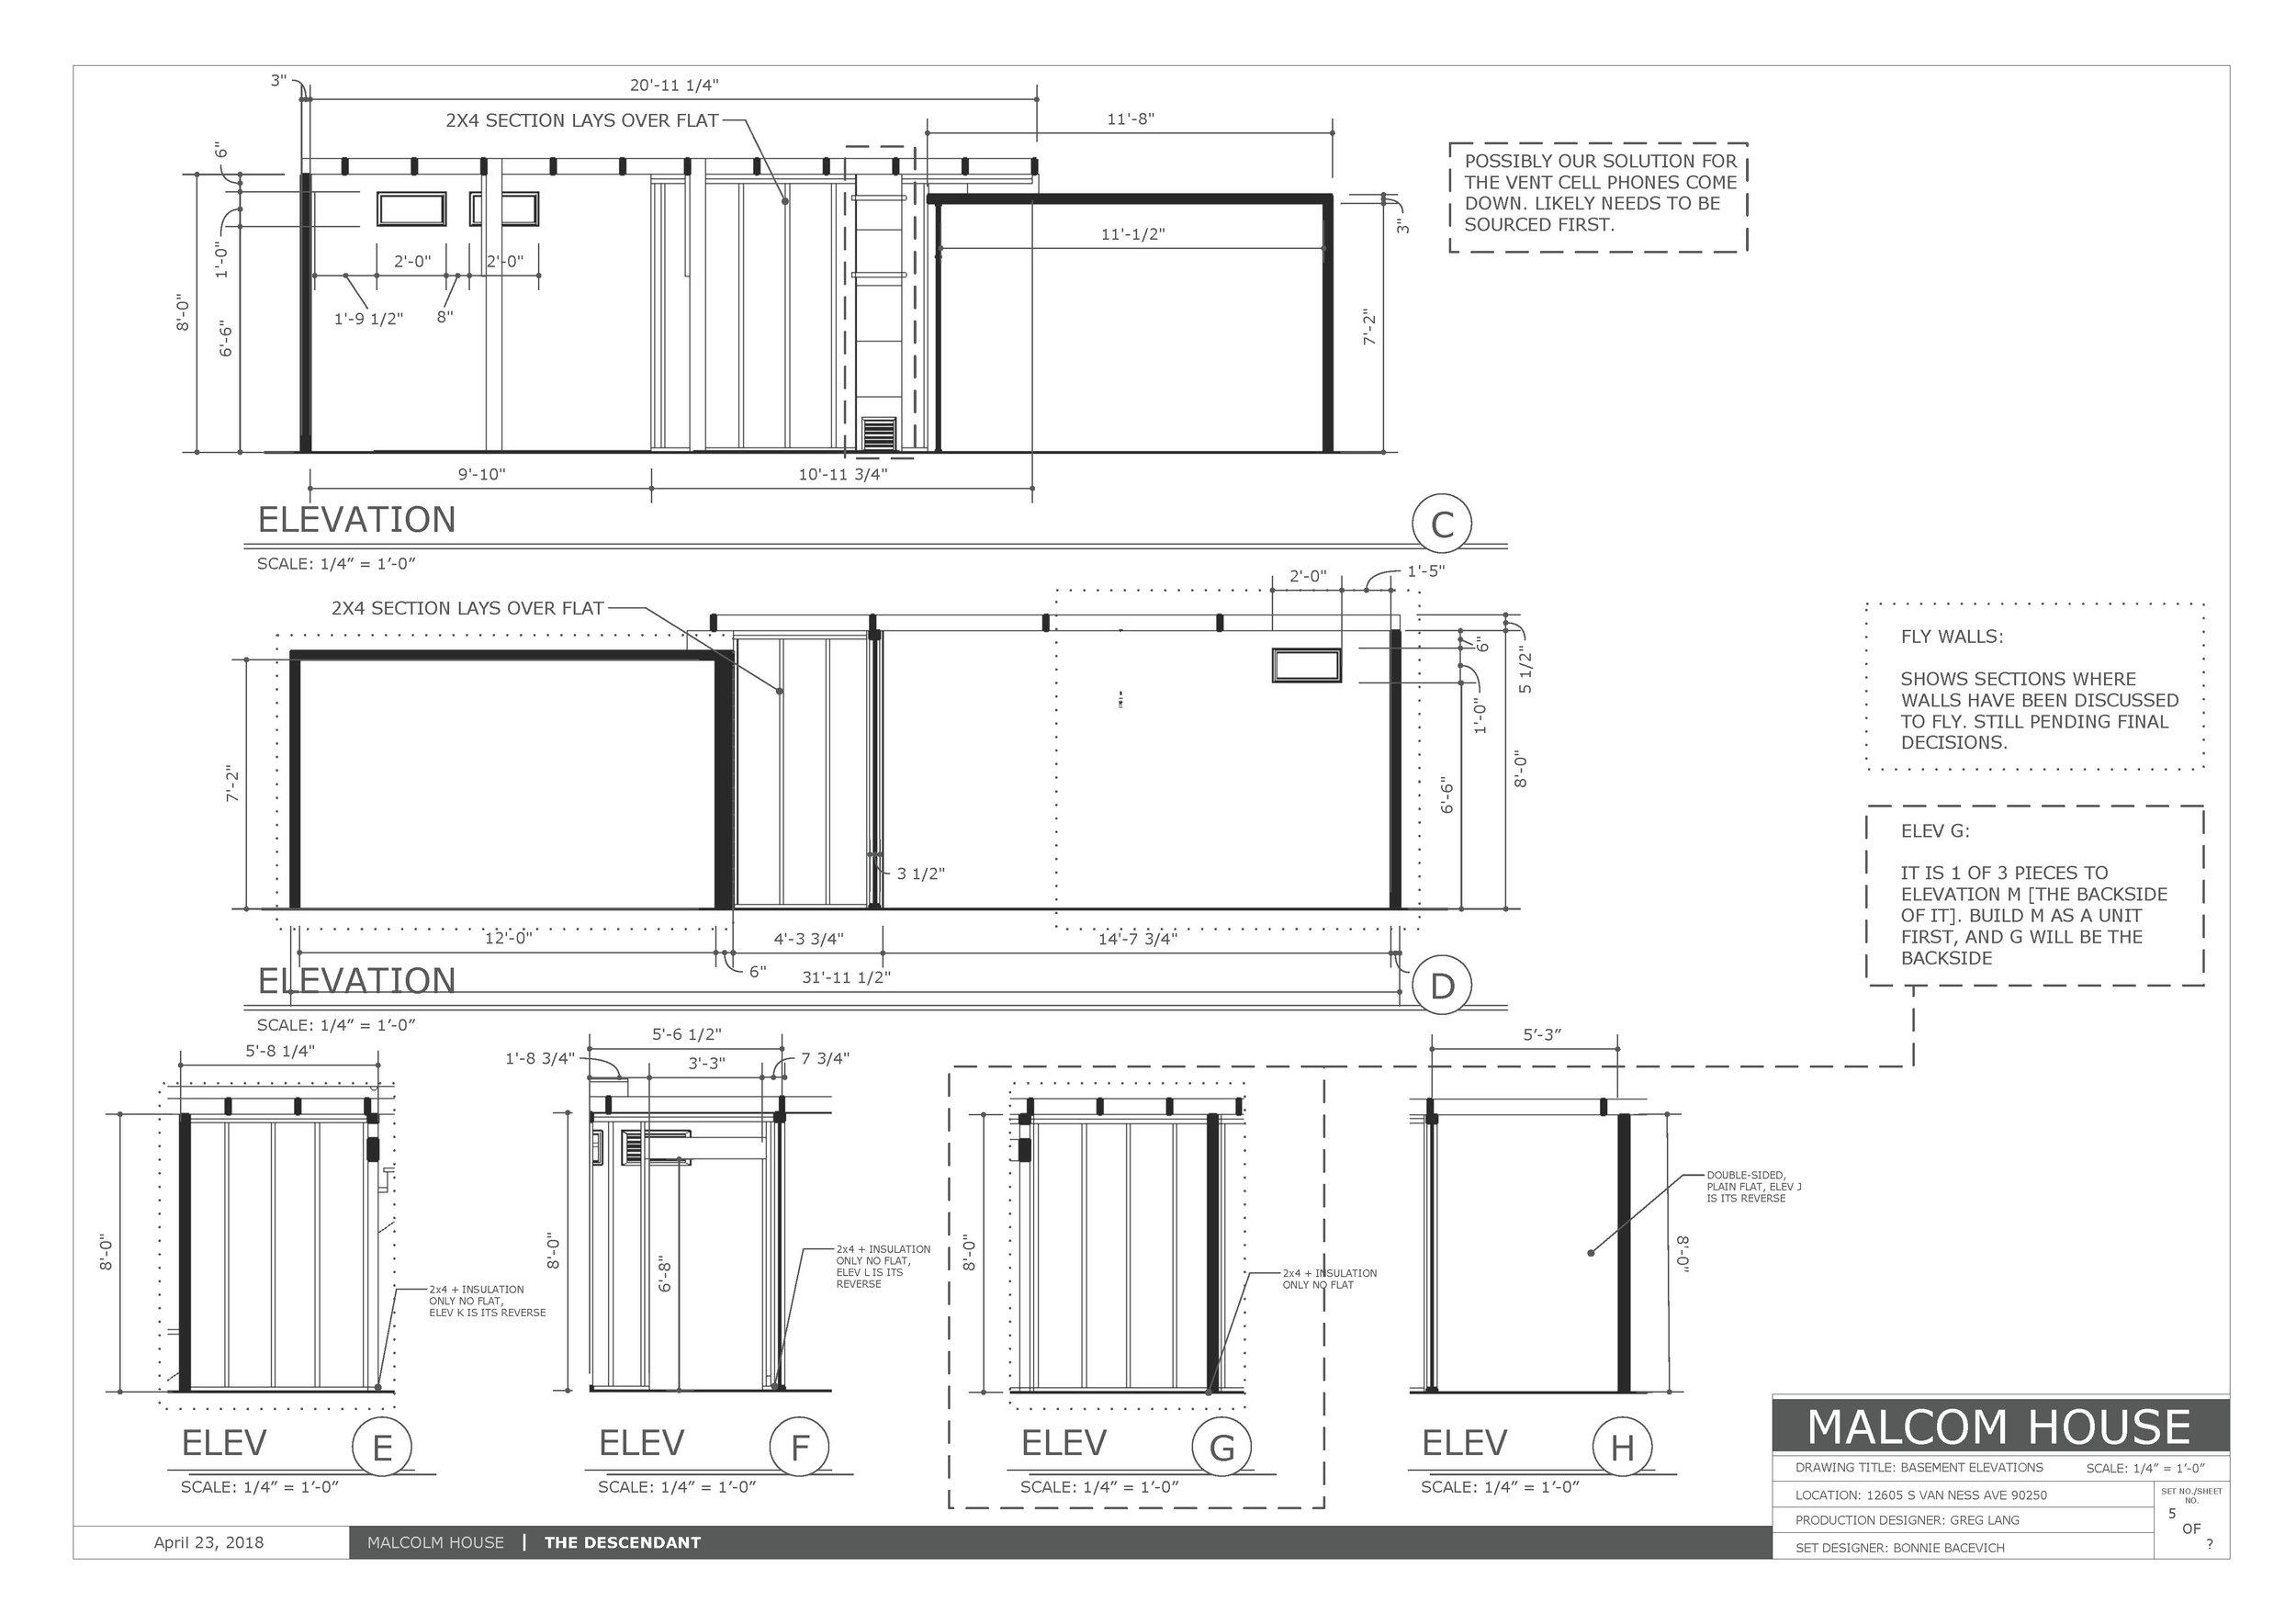 DESCENDANT DRAWINGS 4_23_Page_05.jpg